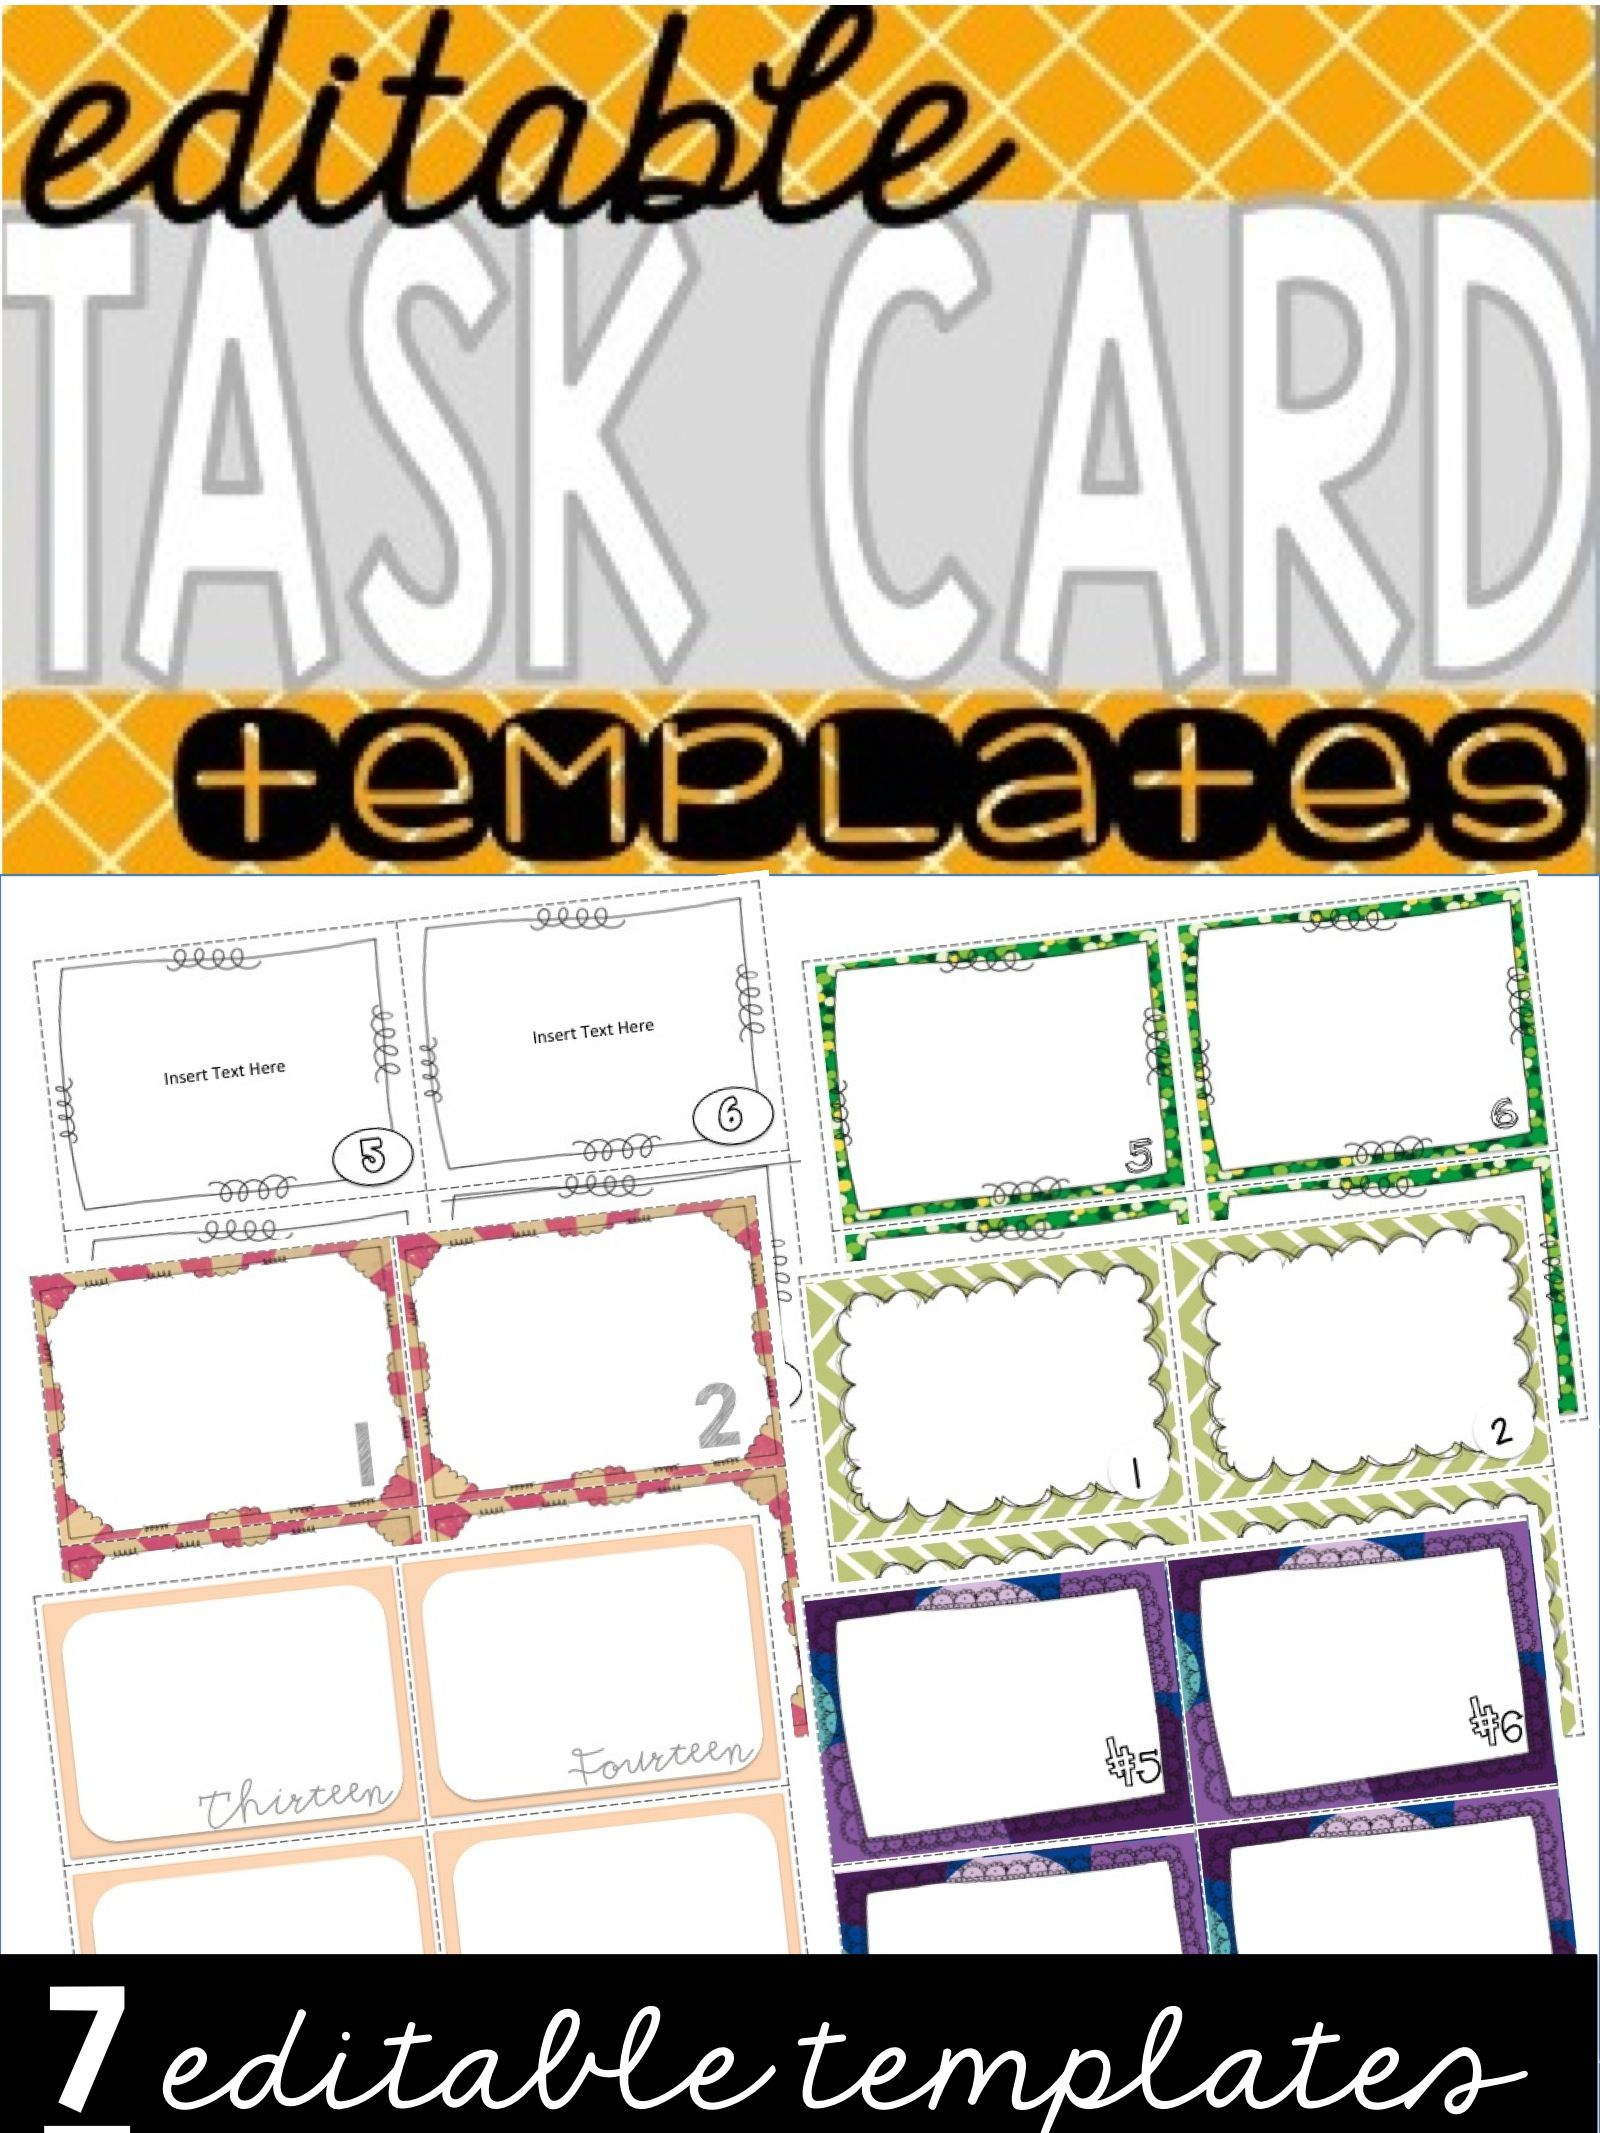 Editable Task Card Templates 7 Sets